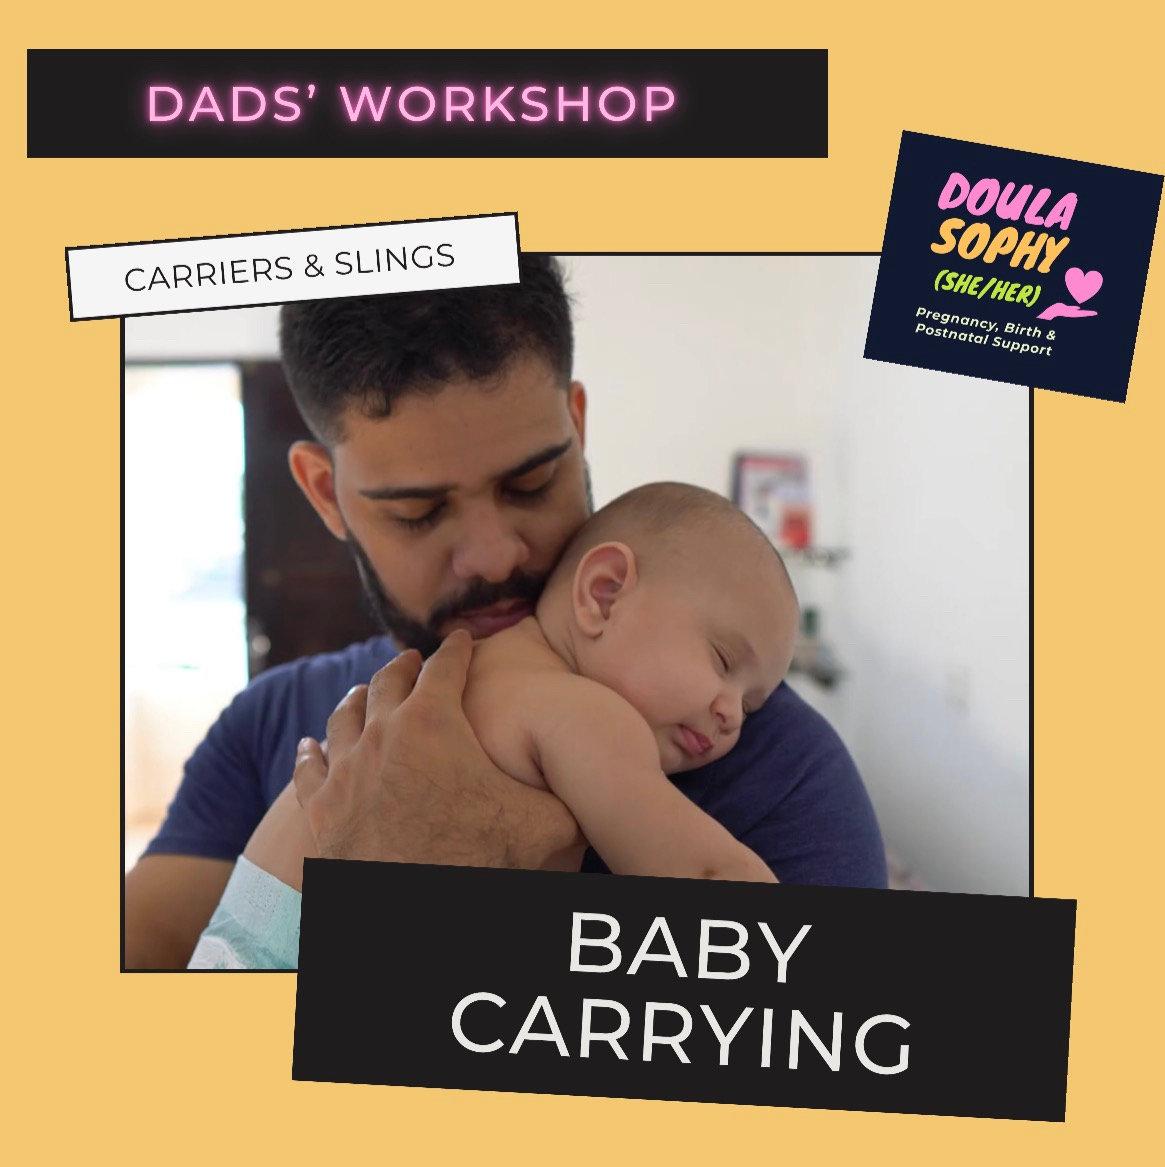 Dads' Workshop - Using Slings & Carriers